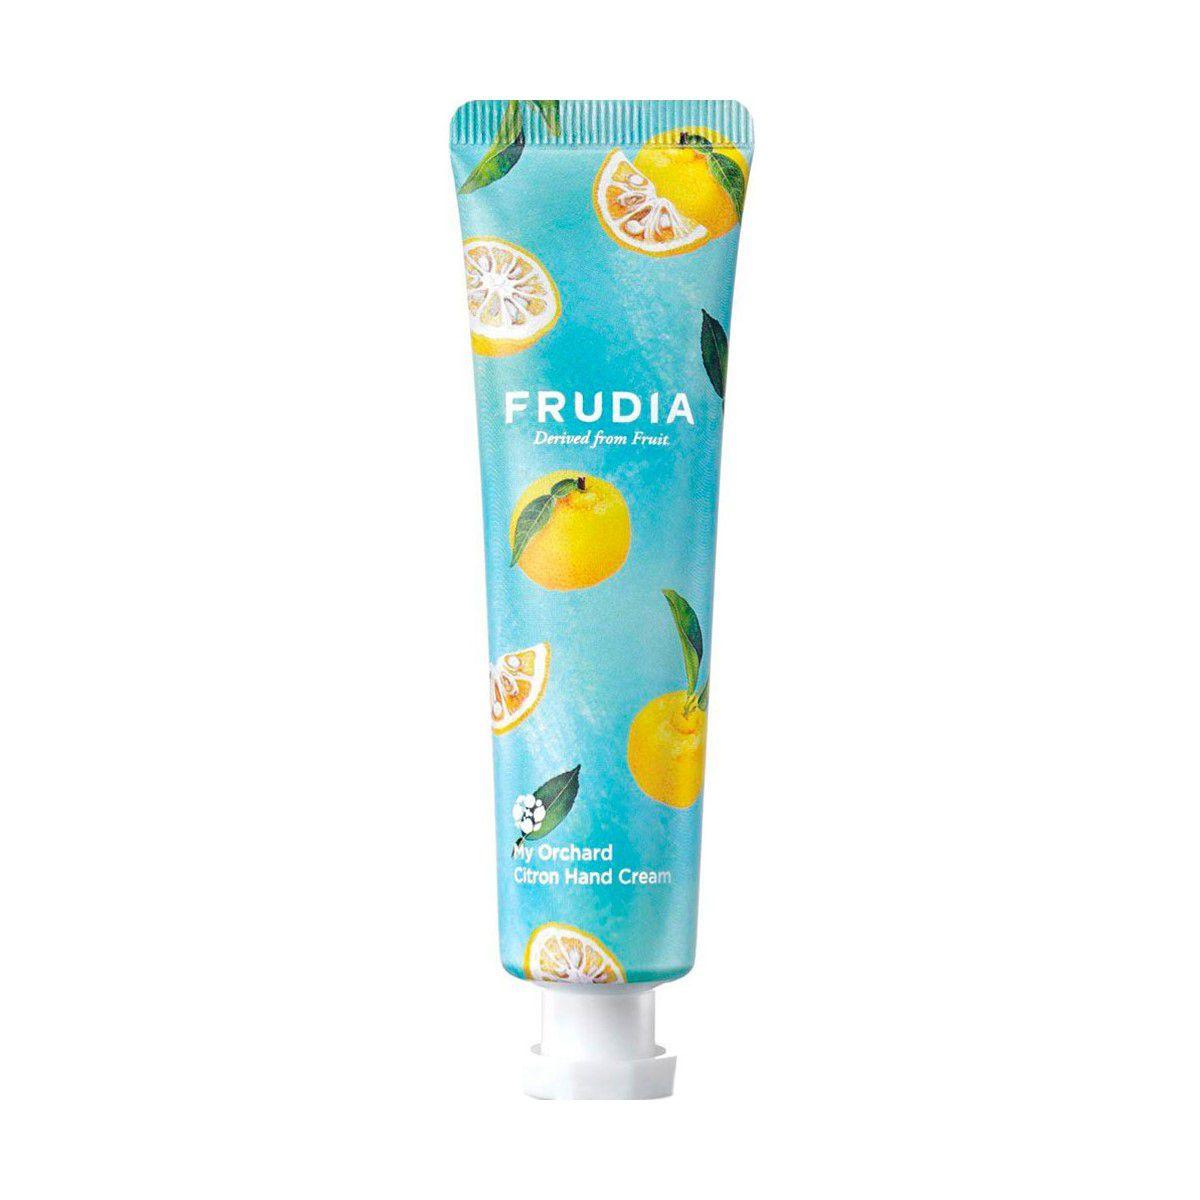 FRUDIA My Orchard Citron Hand Creamのバリエーション5